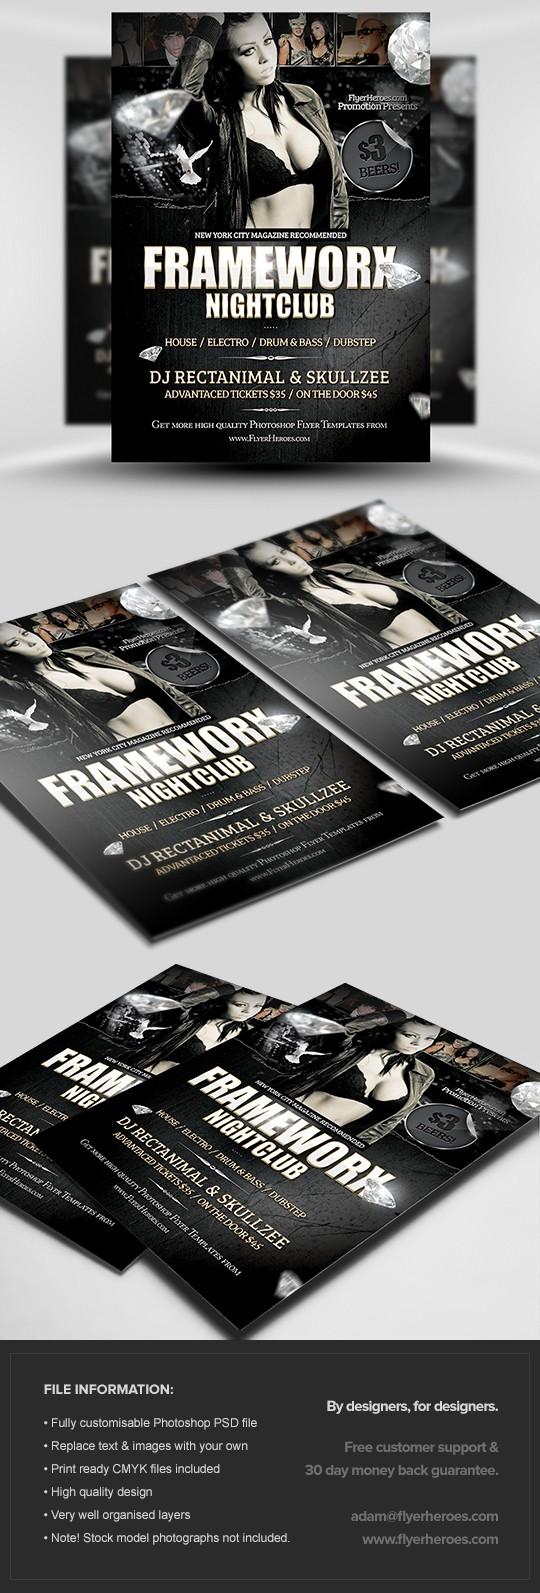 Frameworx 3 Flyer Template